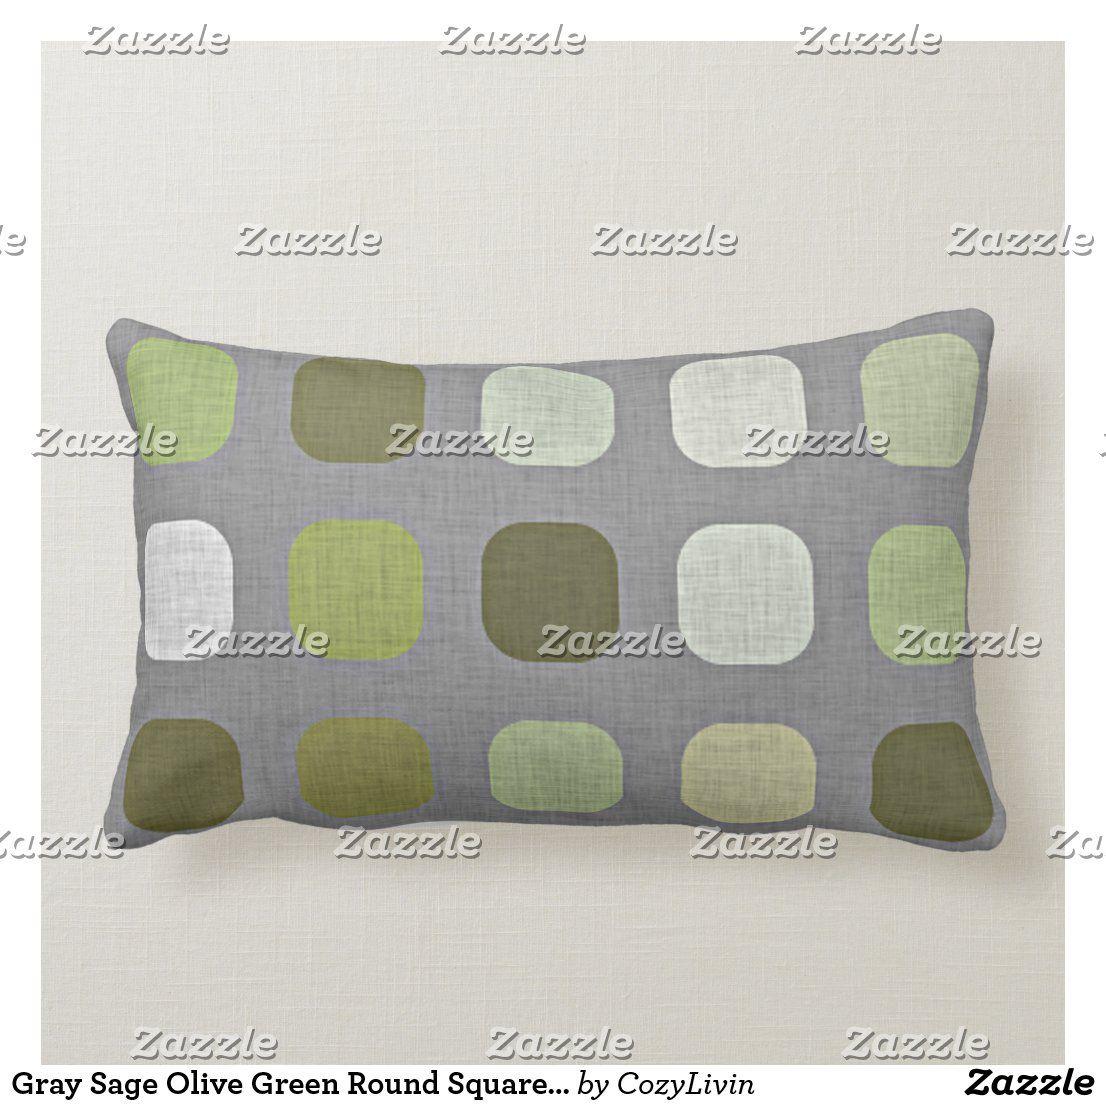 Gray Sage Olive Green Round Squares Art Lumbar Pillow